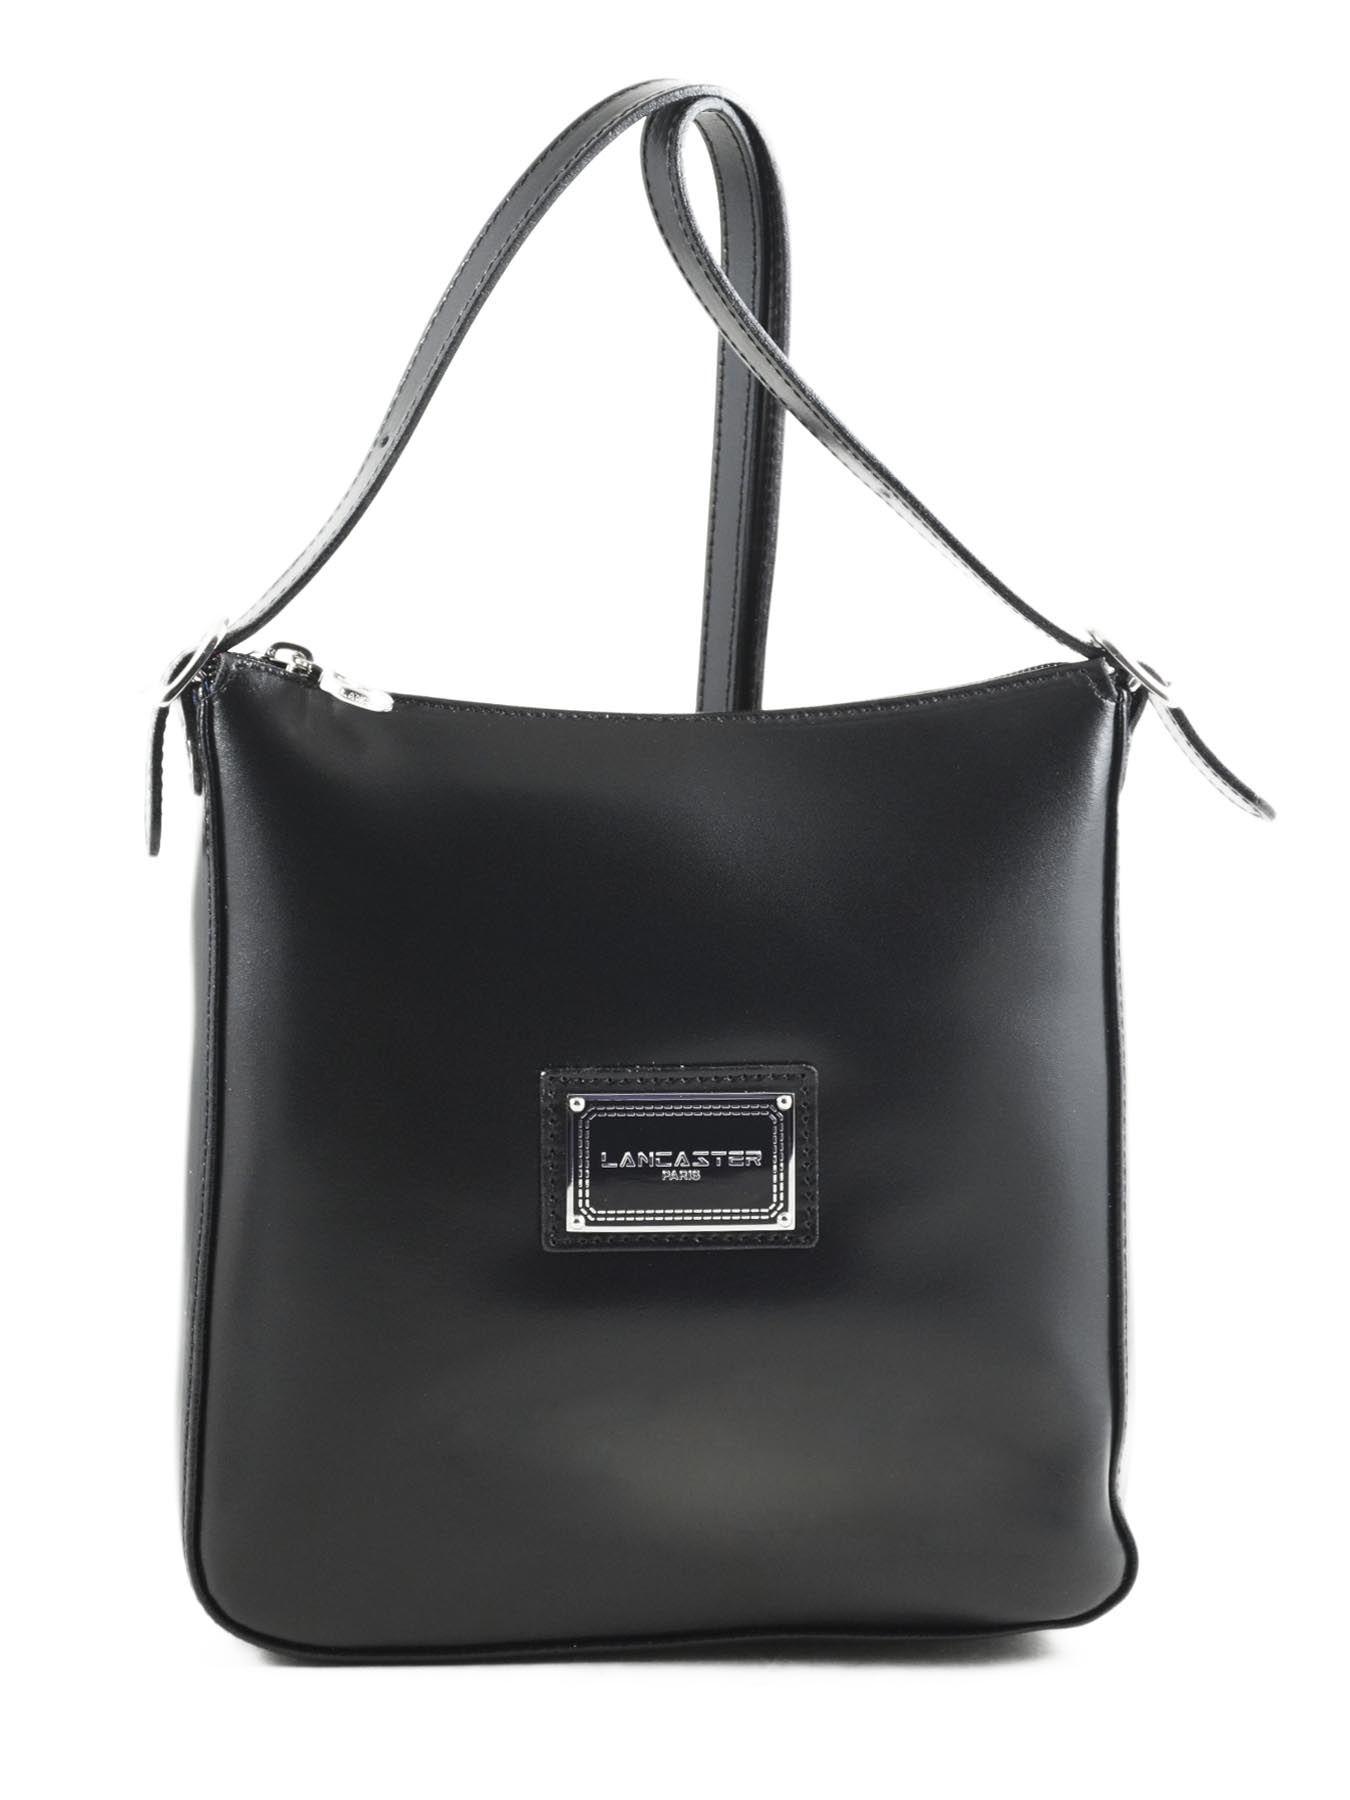 sac lancaster noir e versailles 00438 74. Black Bedroom Furniture Sets. Home Design Ideas